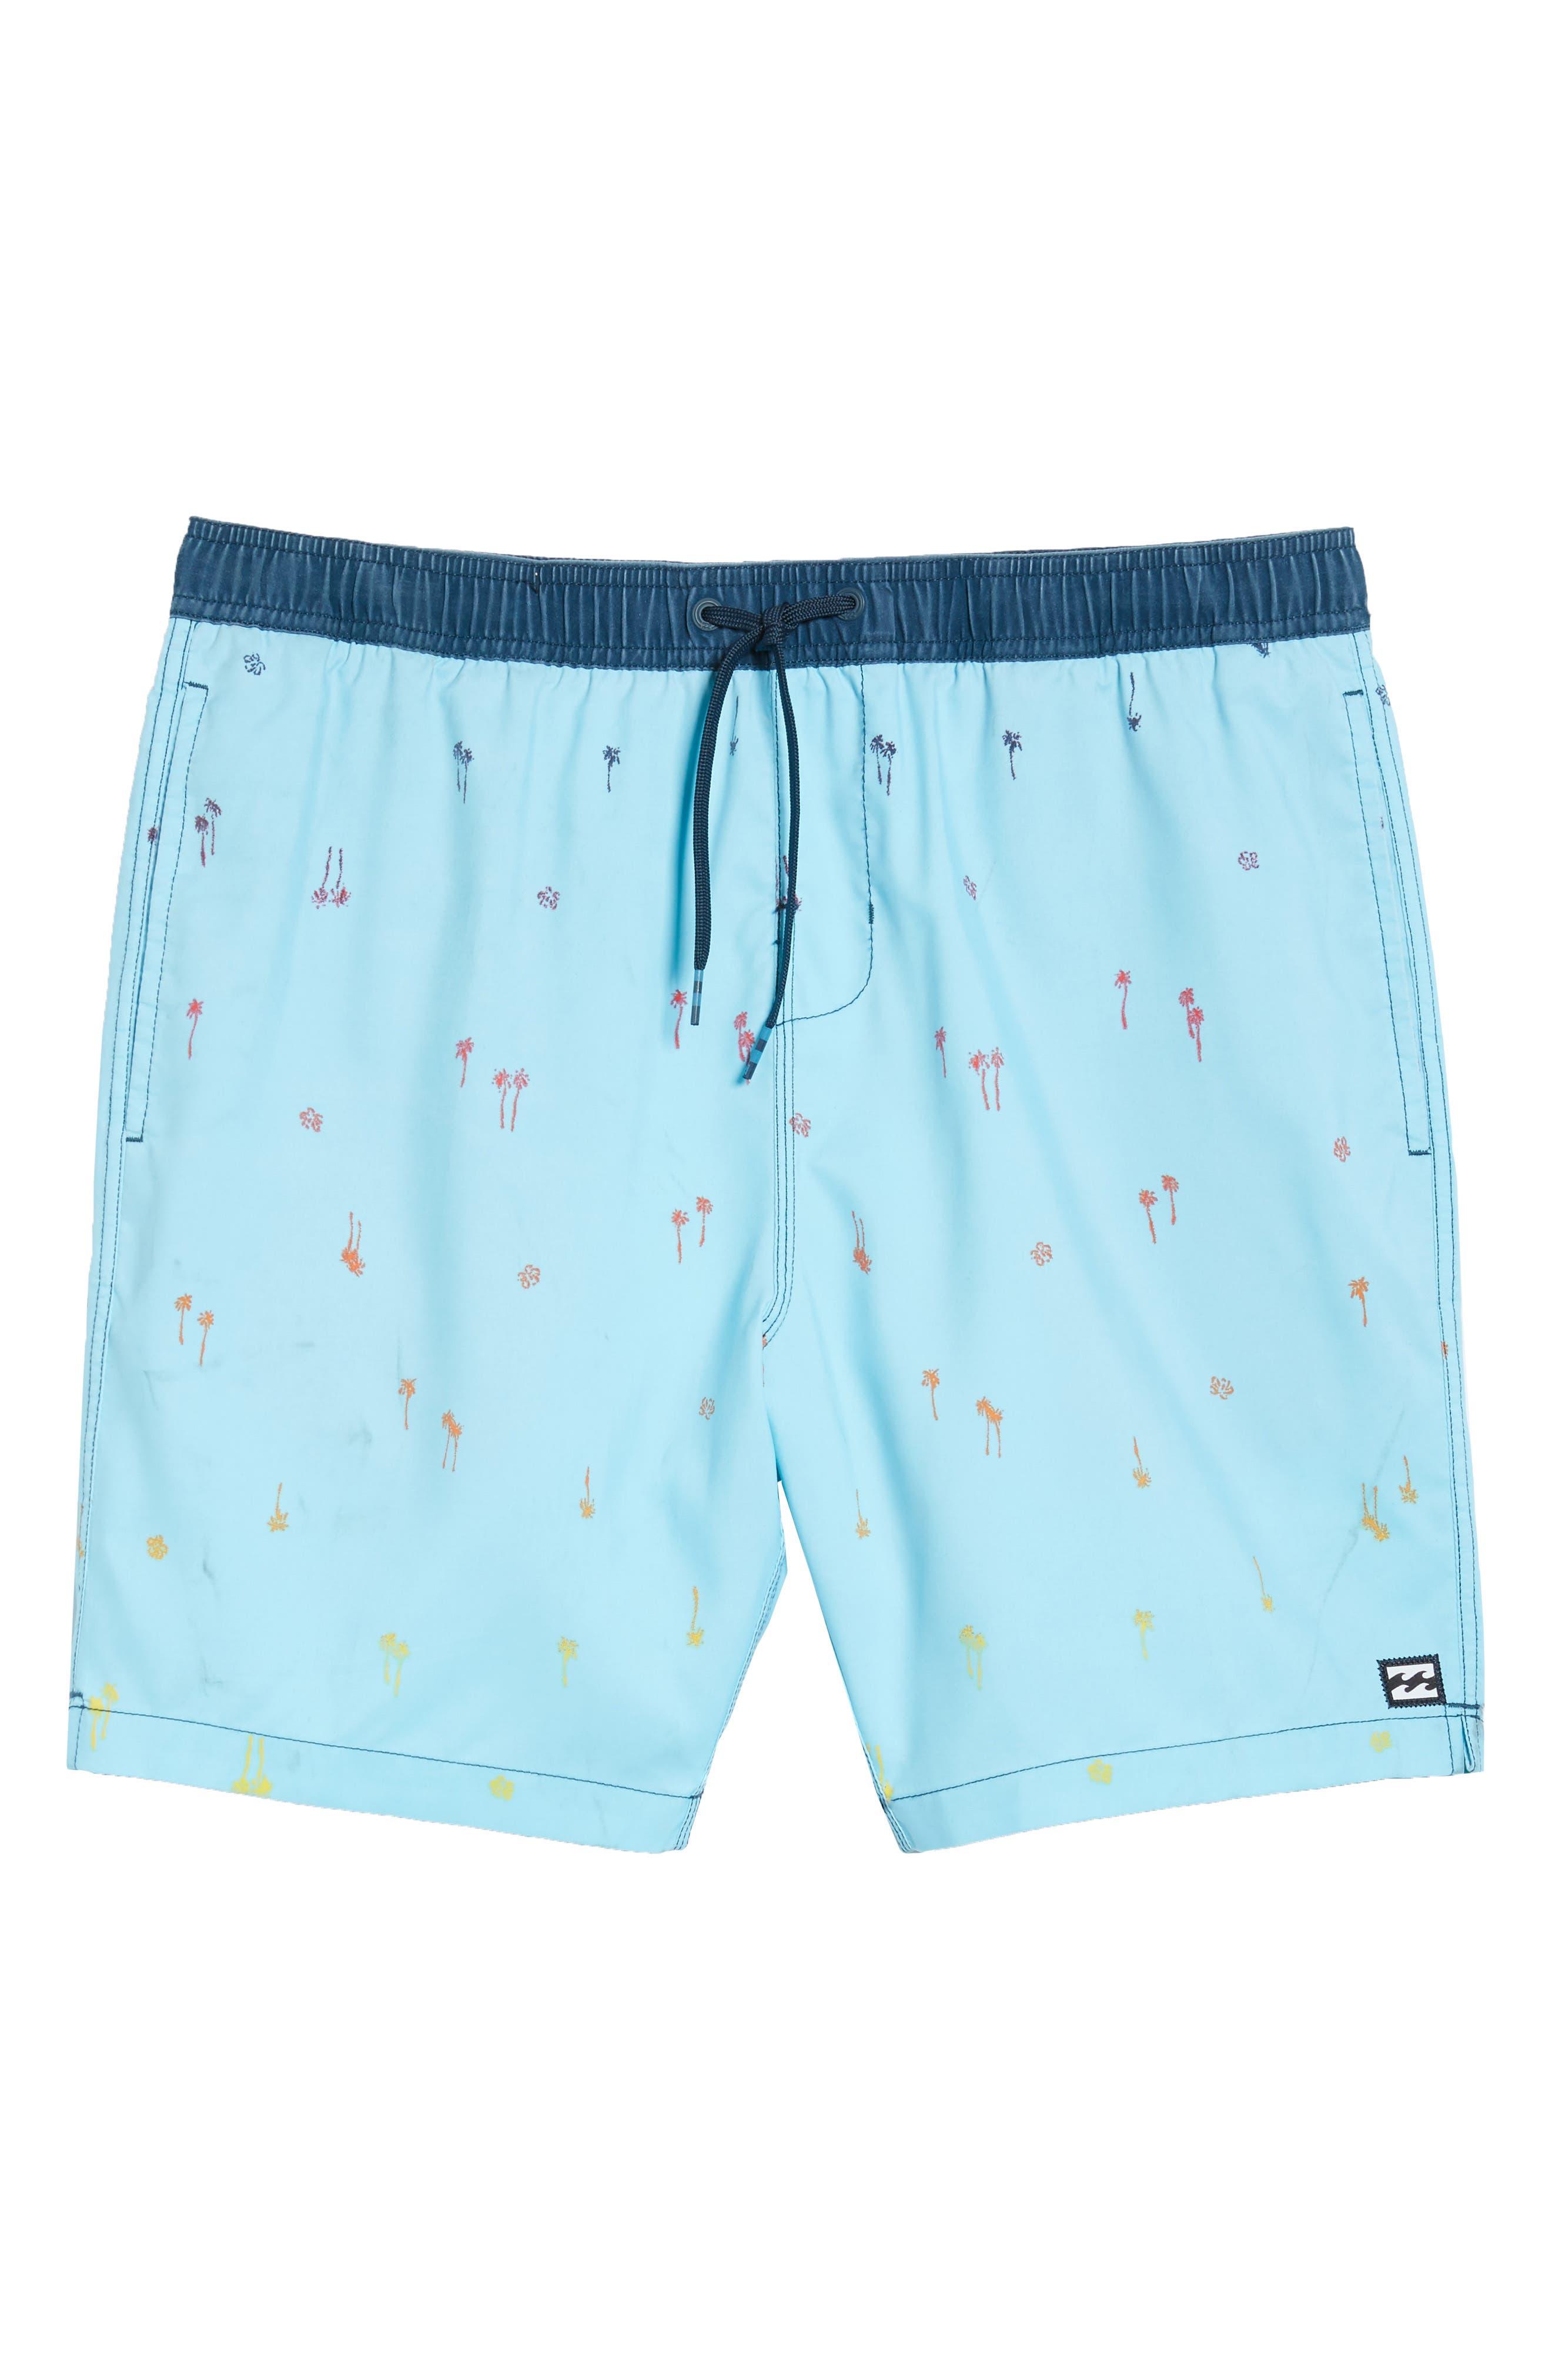 Sundays Layback Board Shorts,                             Alternate thumbnail 6, color,                             Light Blue